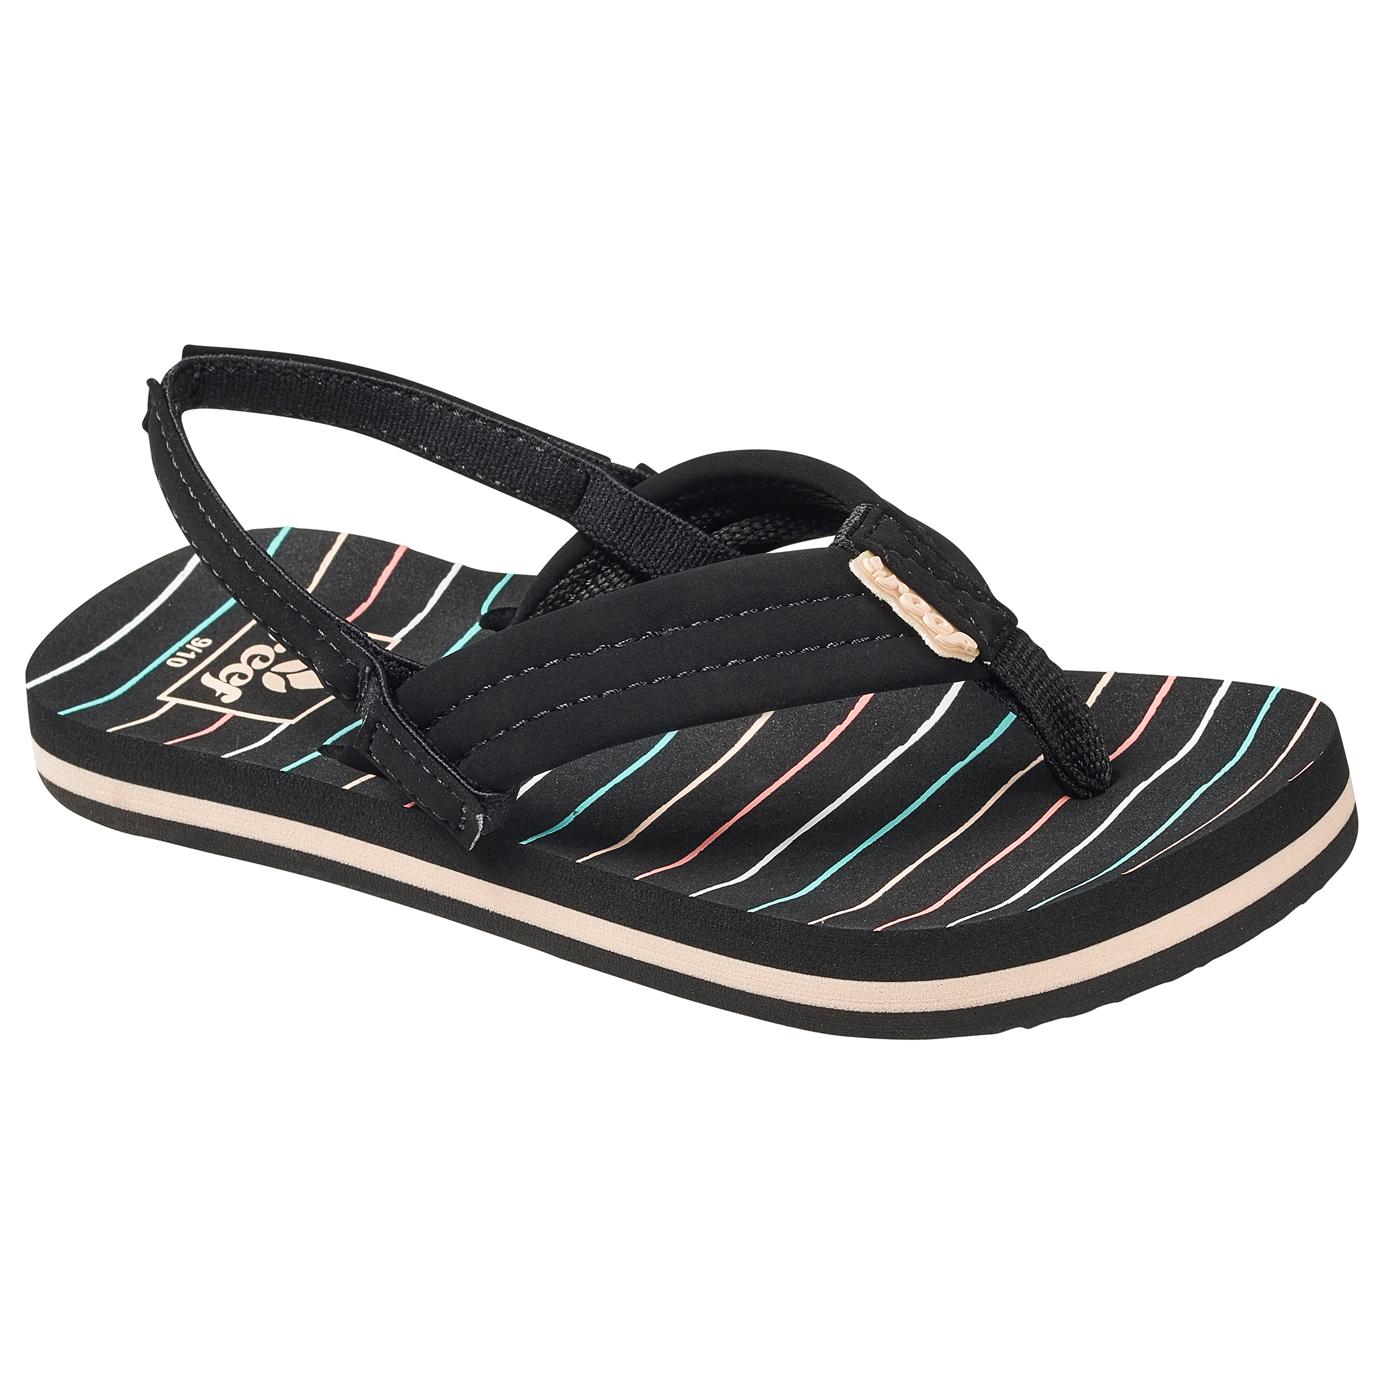 5ac269664354 Reef Little Ahi - Sandals Kids